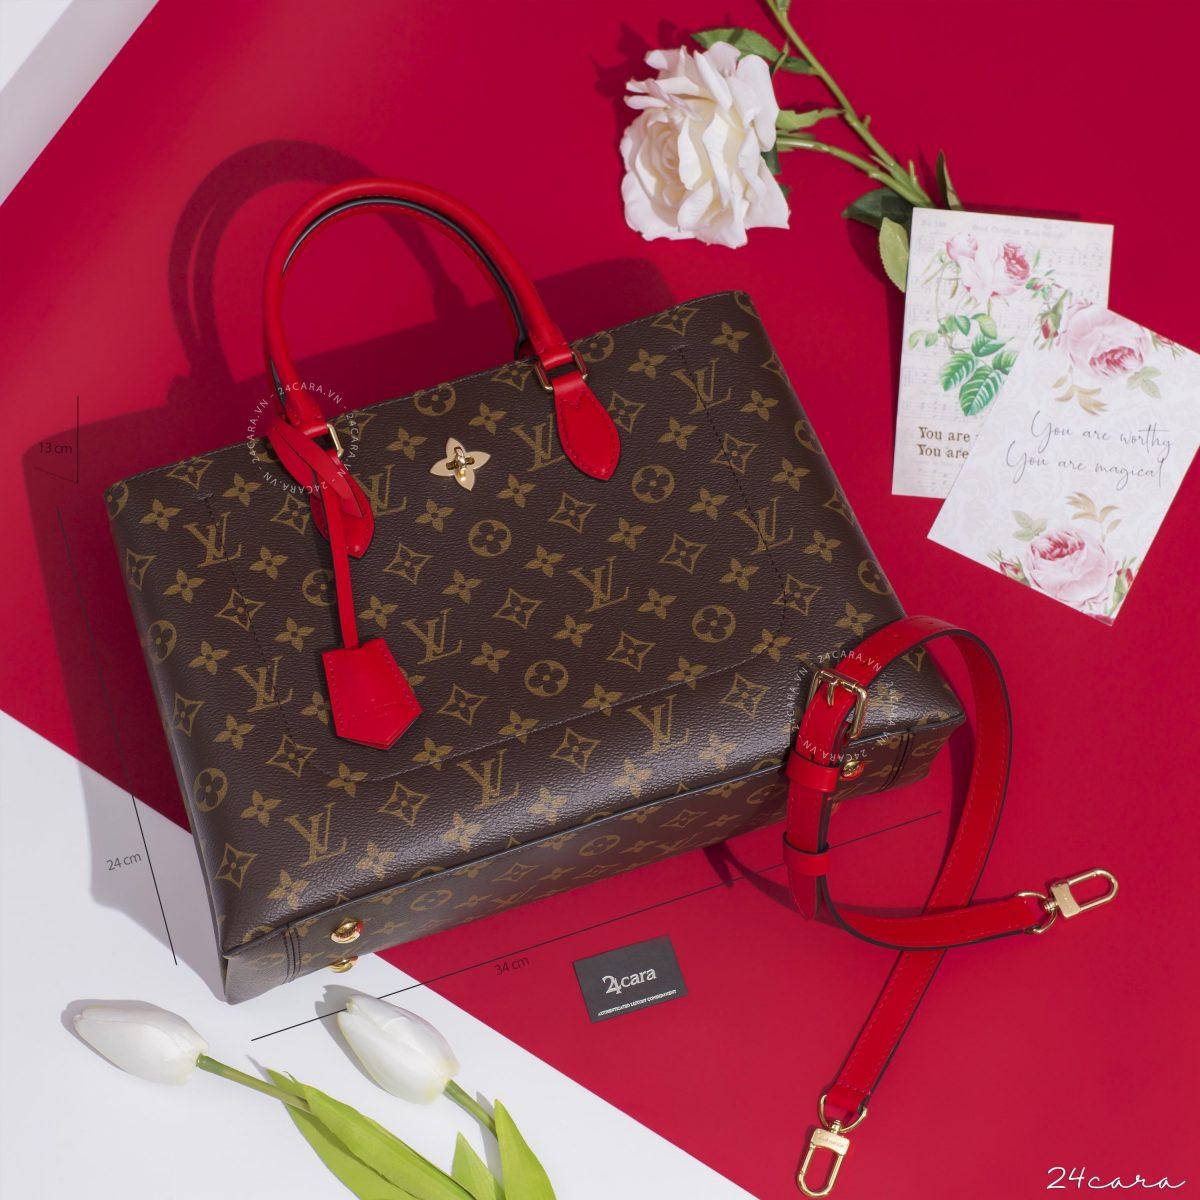 Các mẫu túi xách Louis Vuitton Flower Tote tại 24cara